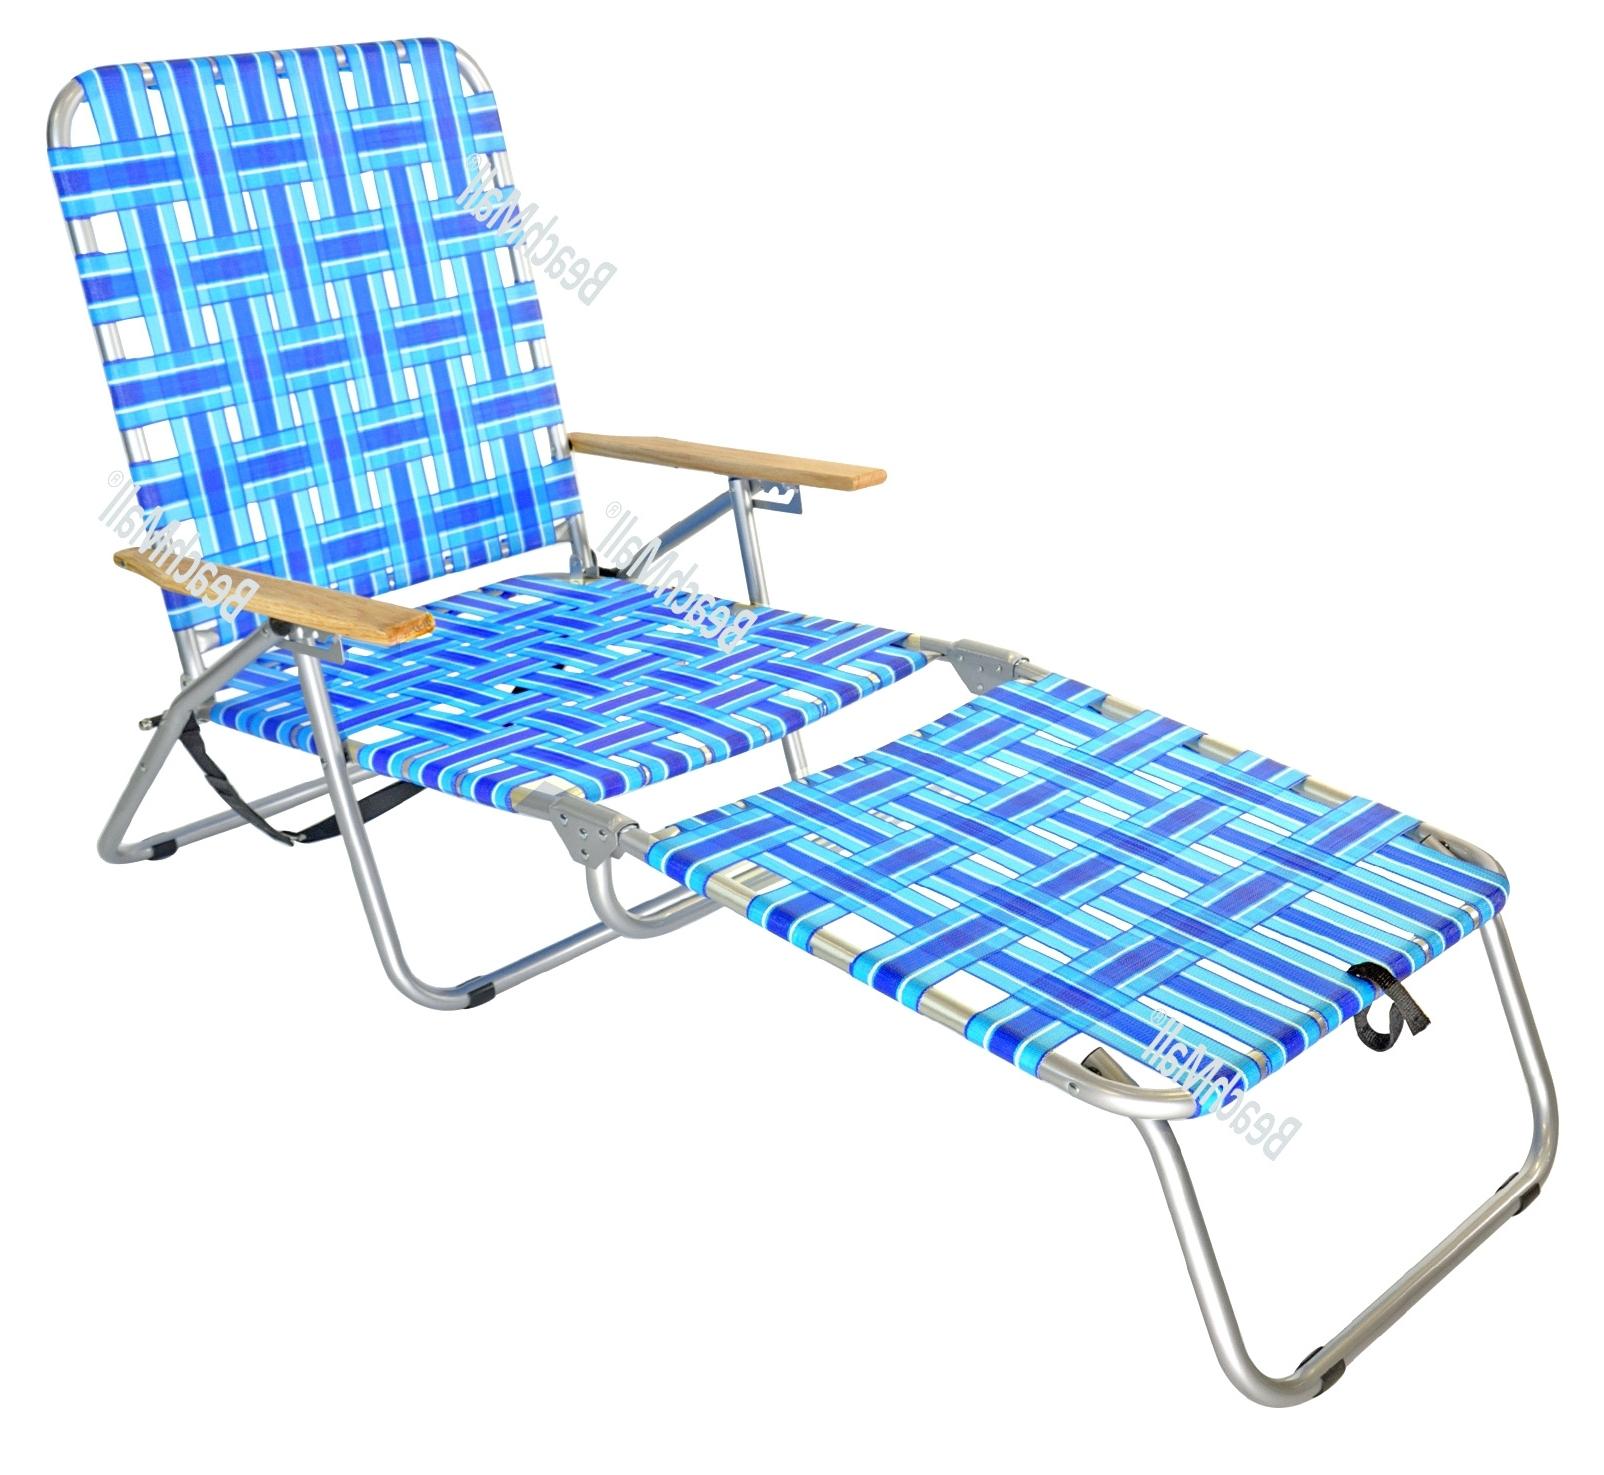 Fashionable Aluminum Folding Lawn Lounge Chair • Lounge Chairs Ideas In Chaise Lawn Chairs (View 2 of 15)